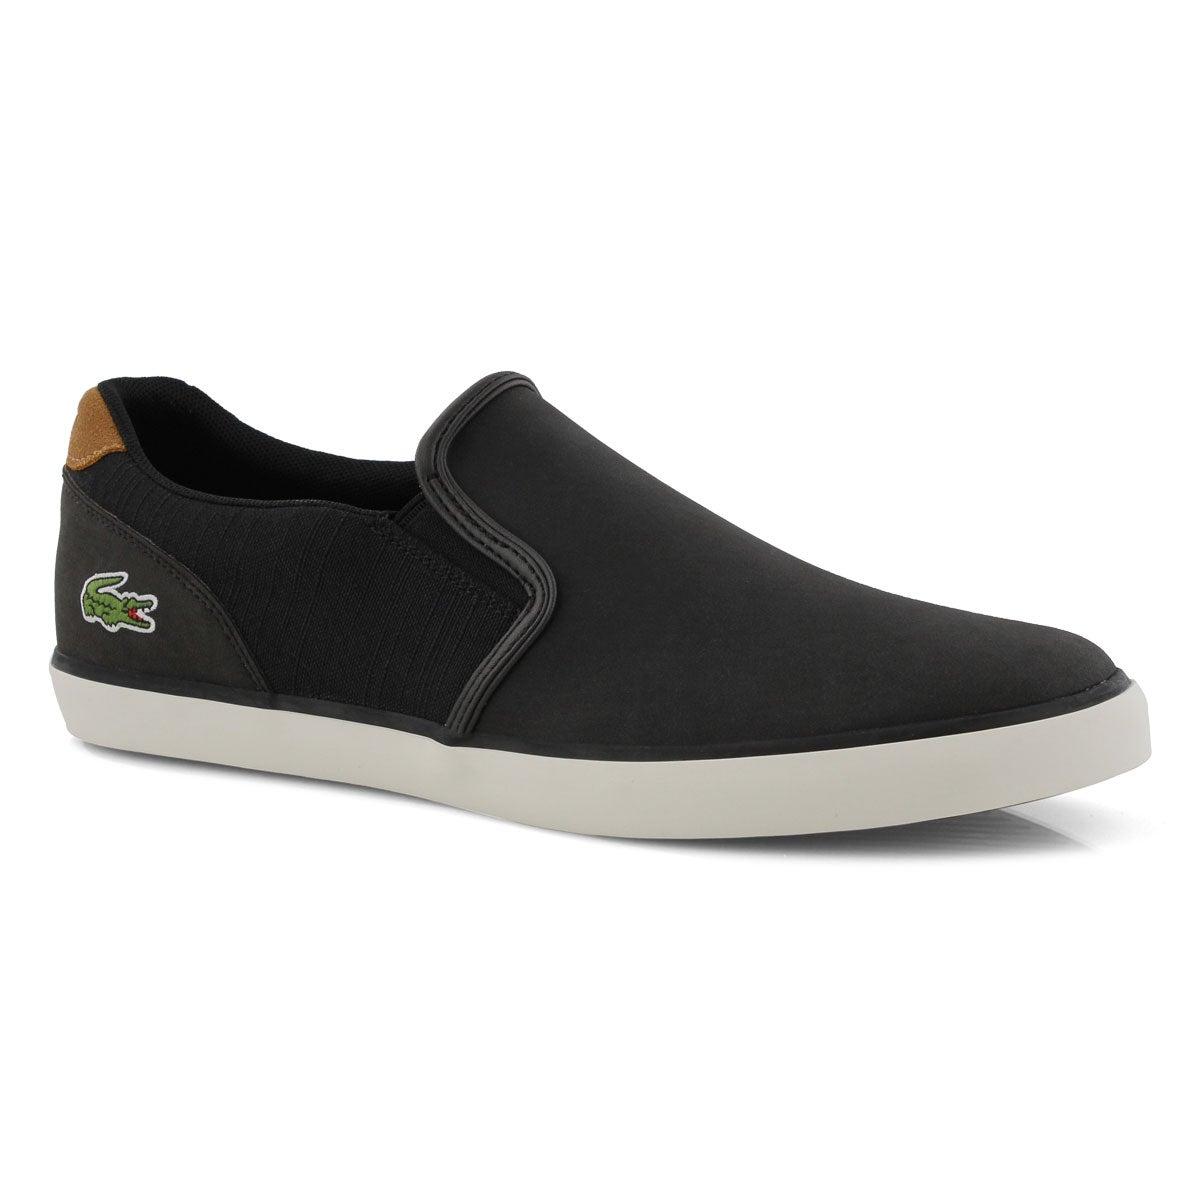 Mns Joueur Slip 119 2 black slip on